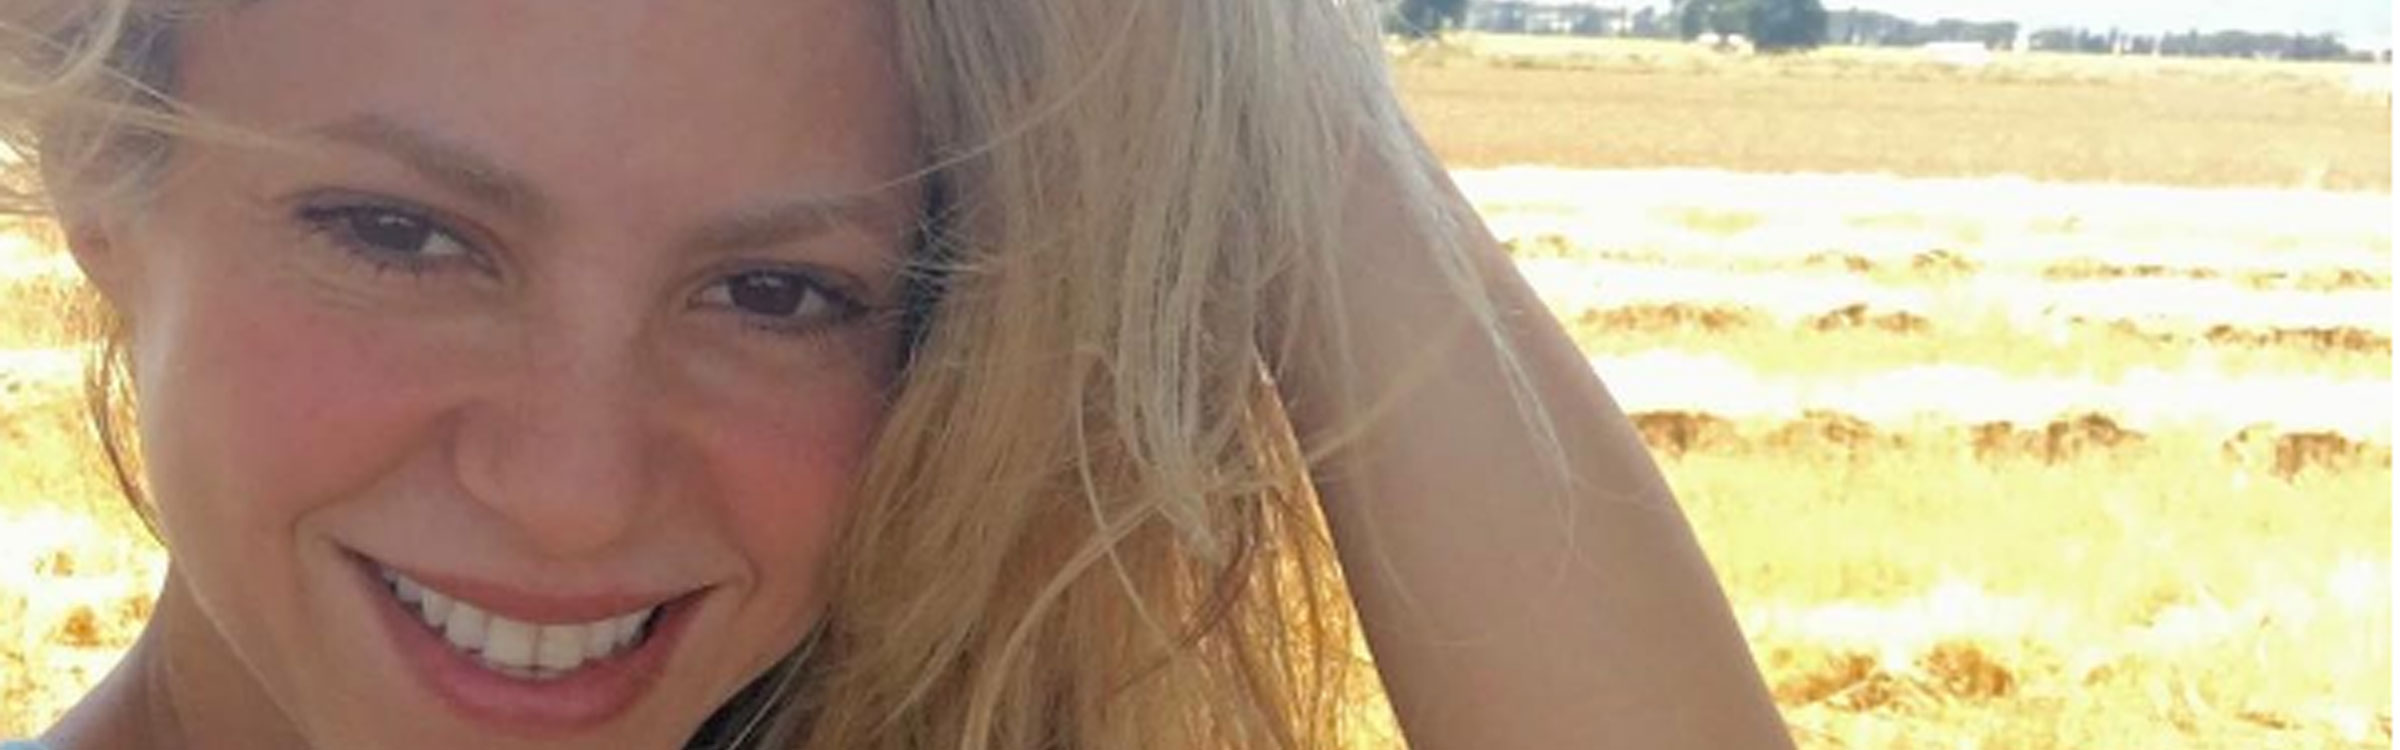 Shakira selfie header